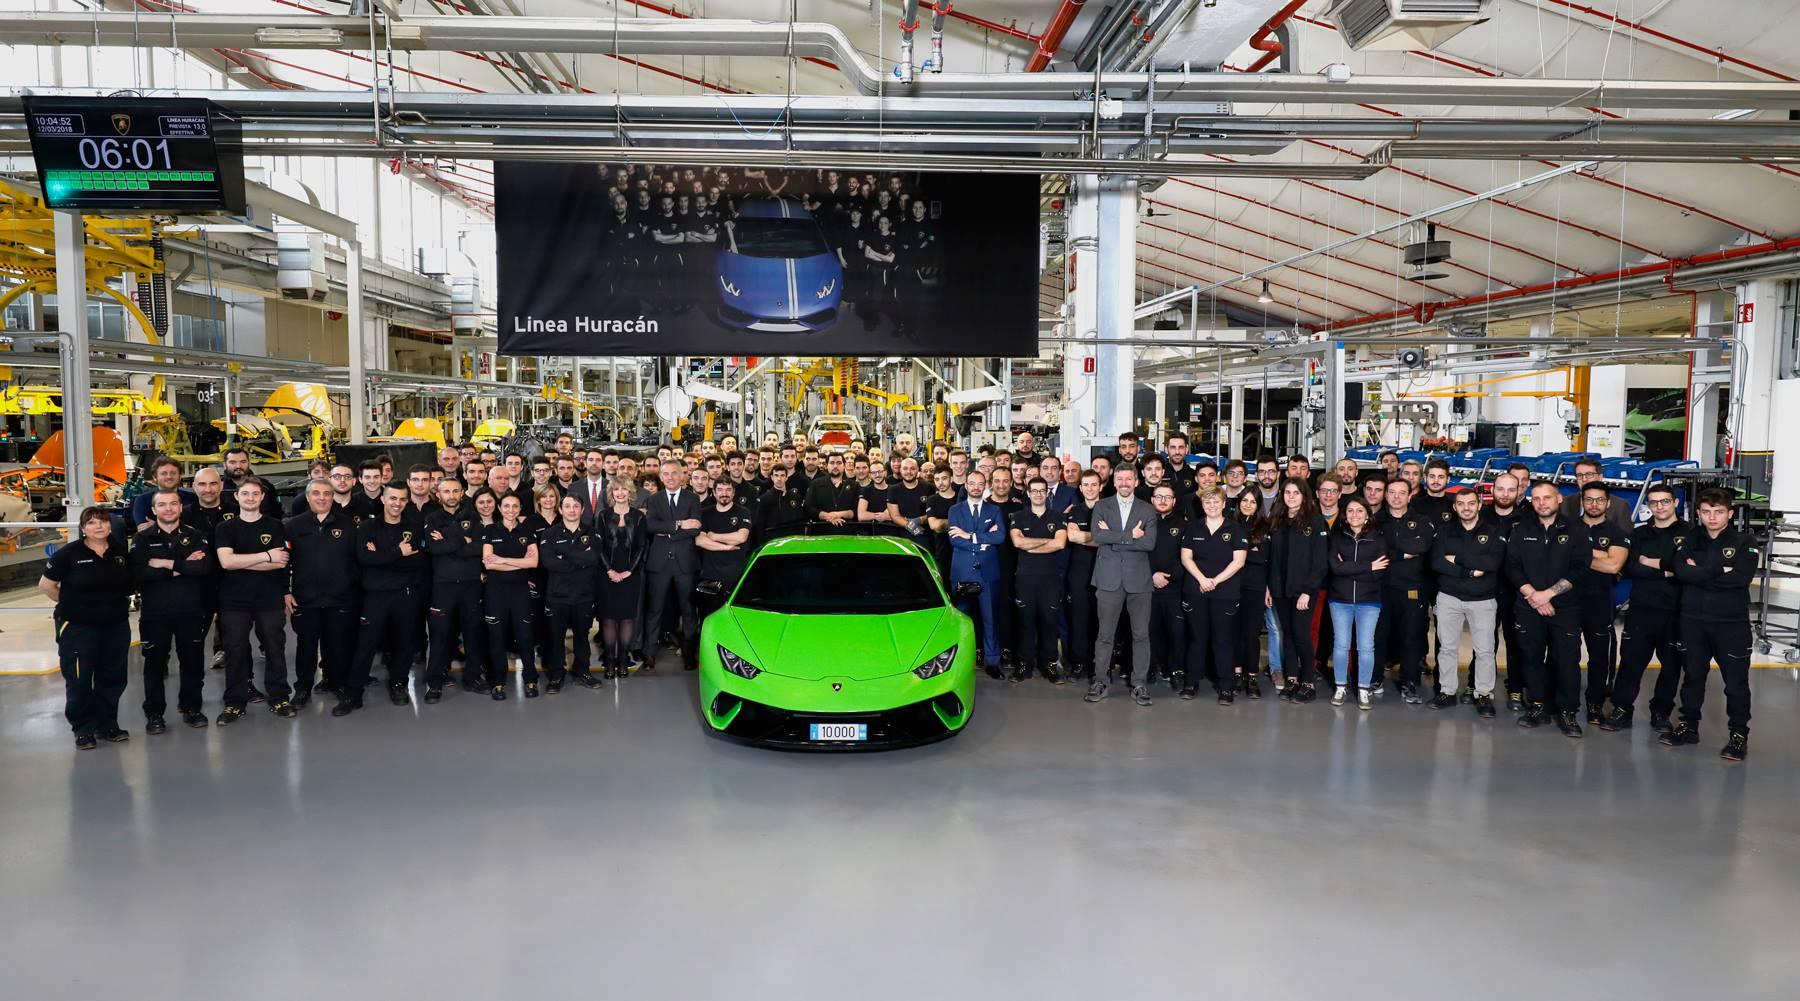 29187158 2357883380903935 7562712731309047808 o 10.000 unidades produzidas – O sucesso comercial do Lamborghini Huracan